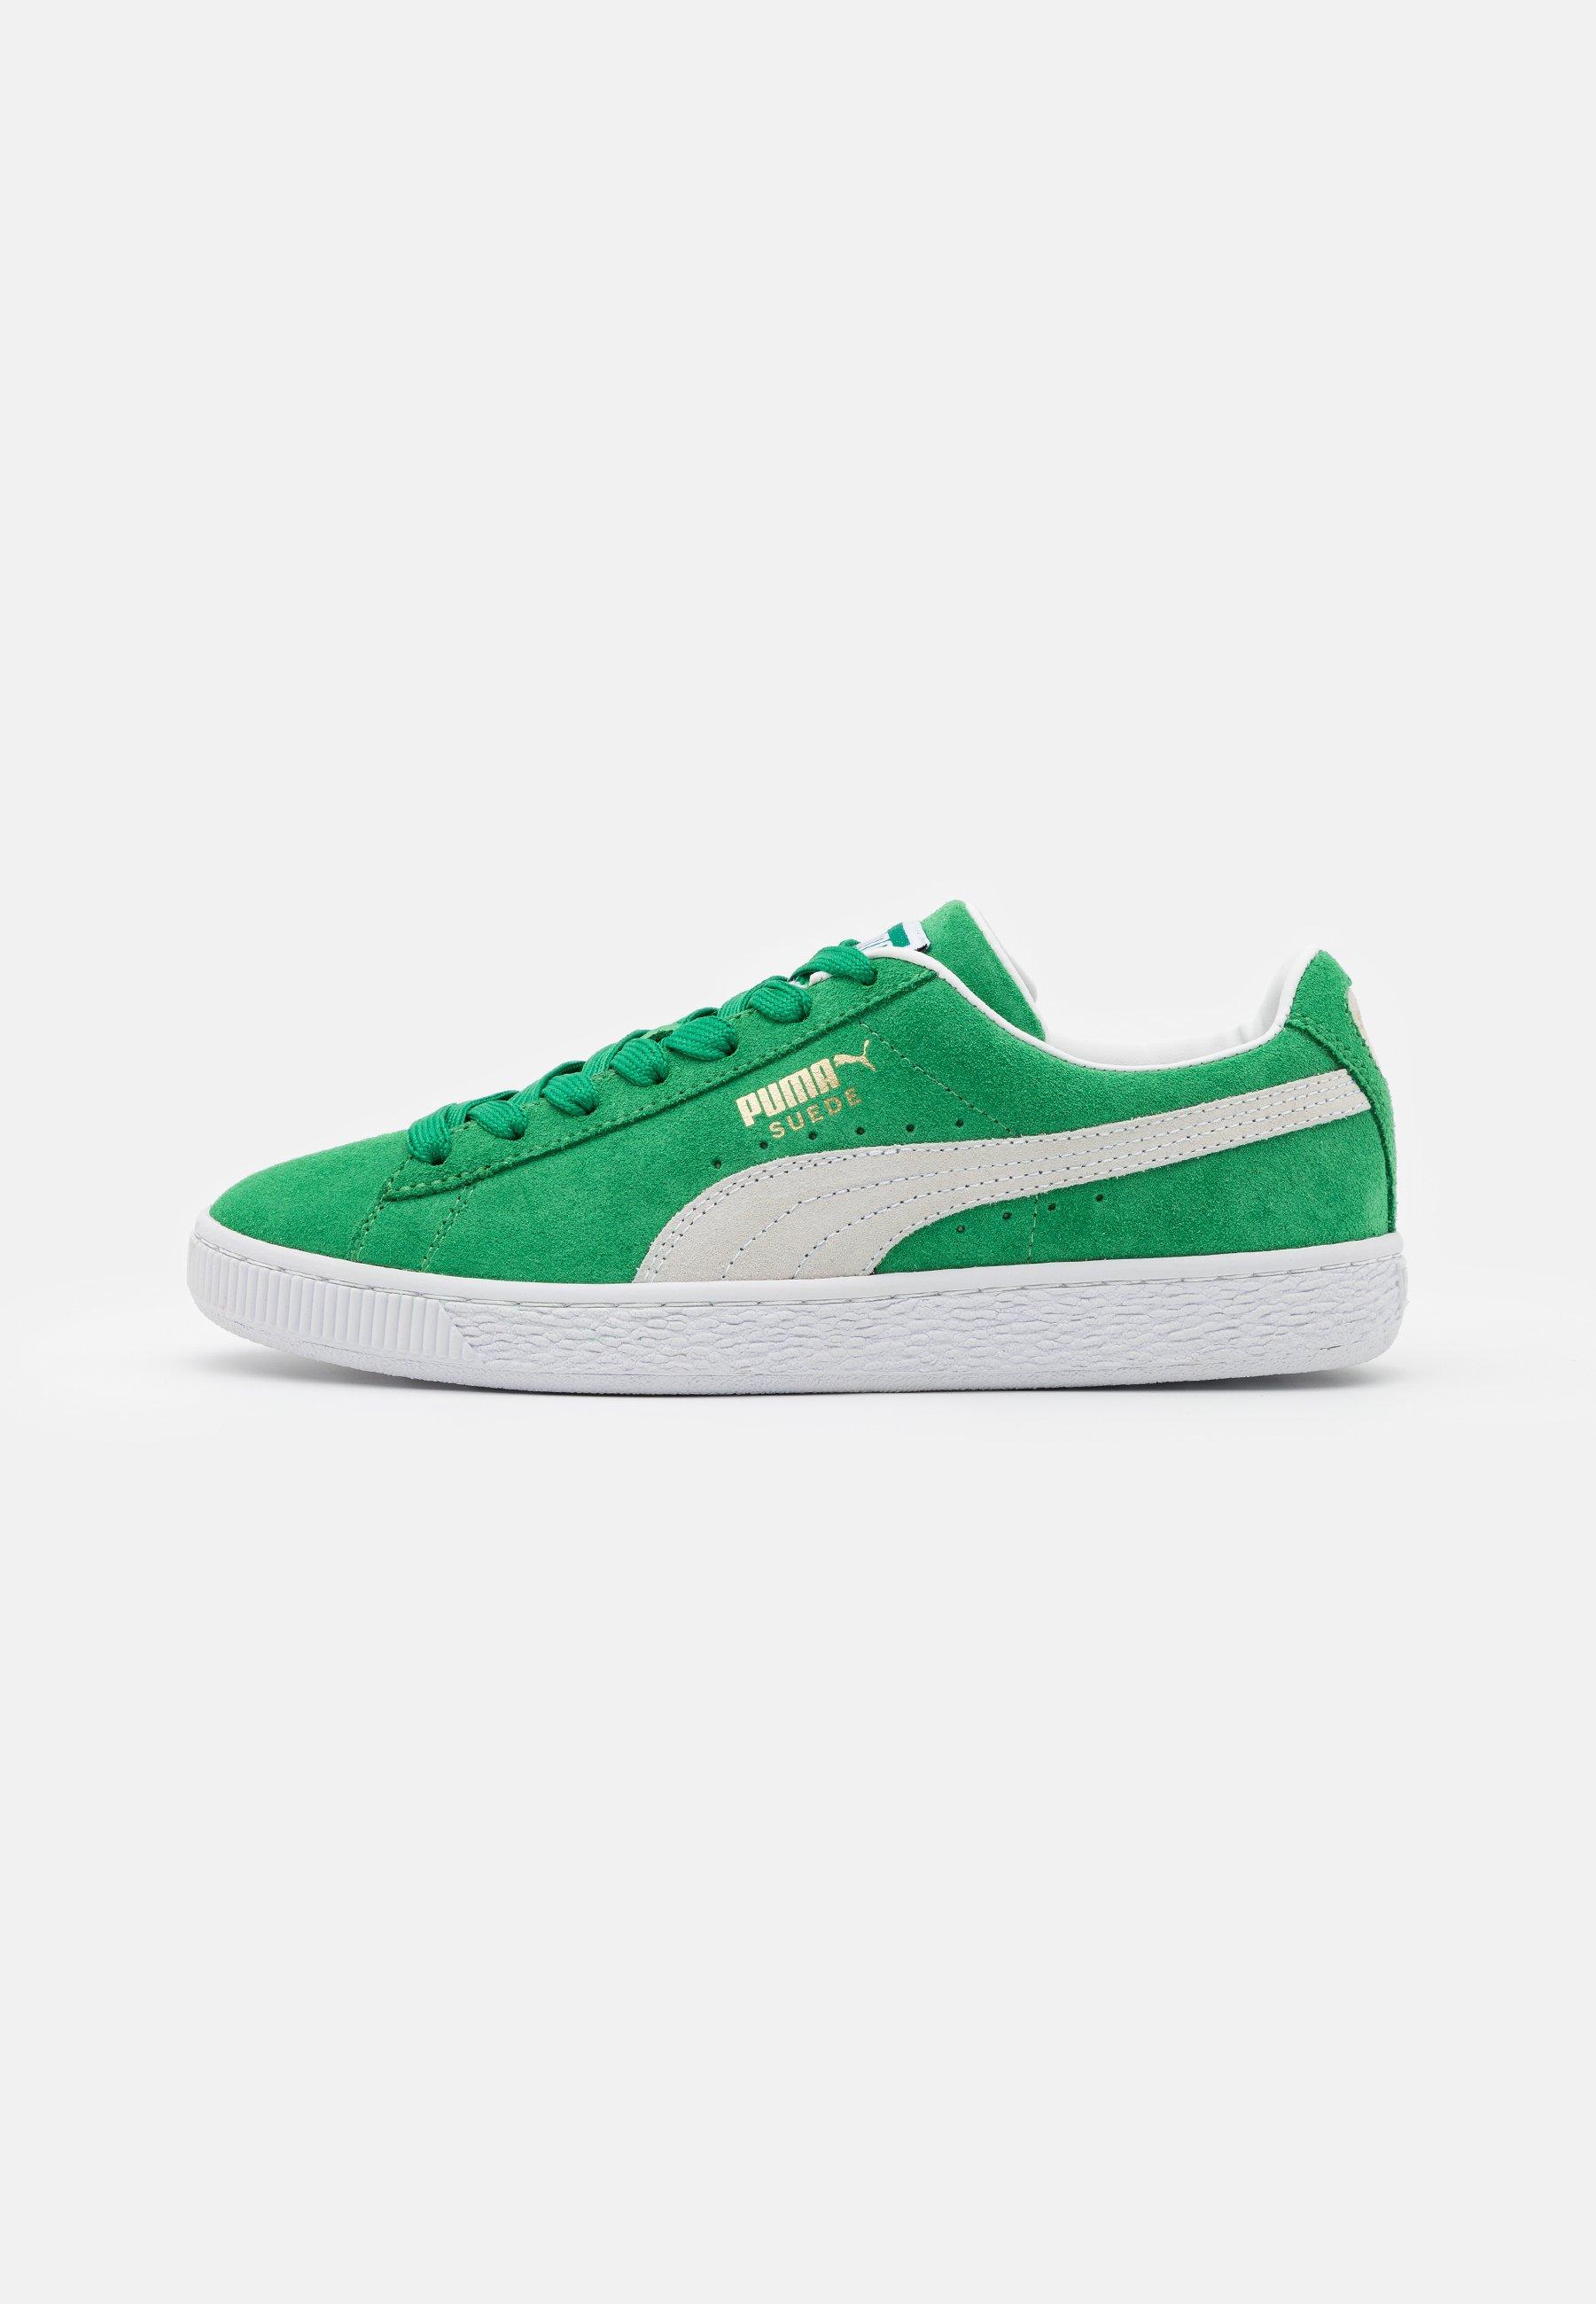 Puma SUEDE TEAMS - Baskets basses - green/white/vert - ZALANDO.FR